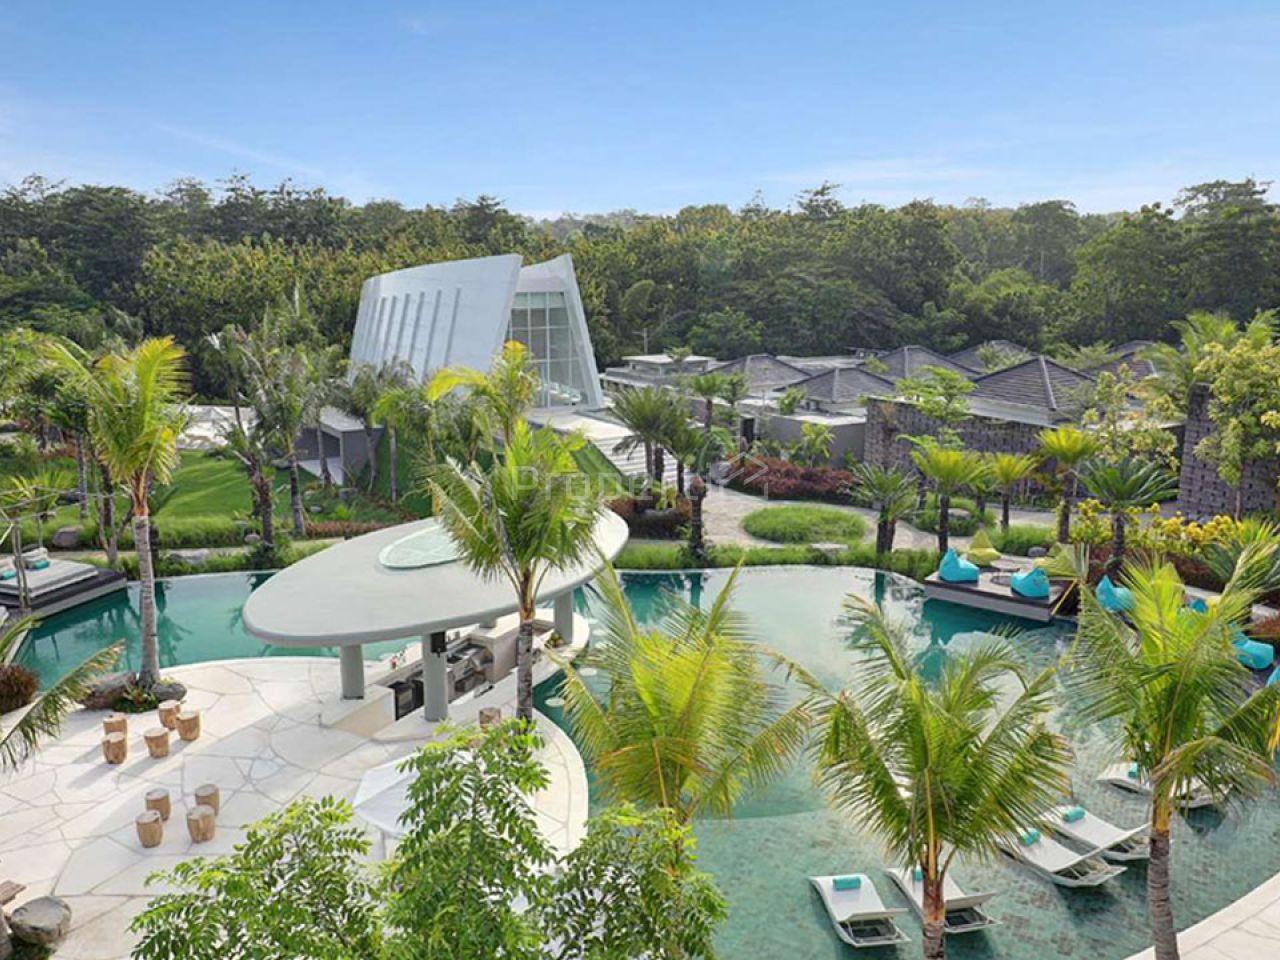 Villa Hak Milik Dekat Pantai Balangan Bali, Bali